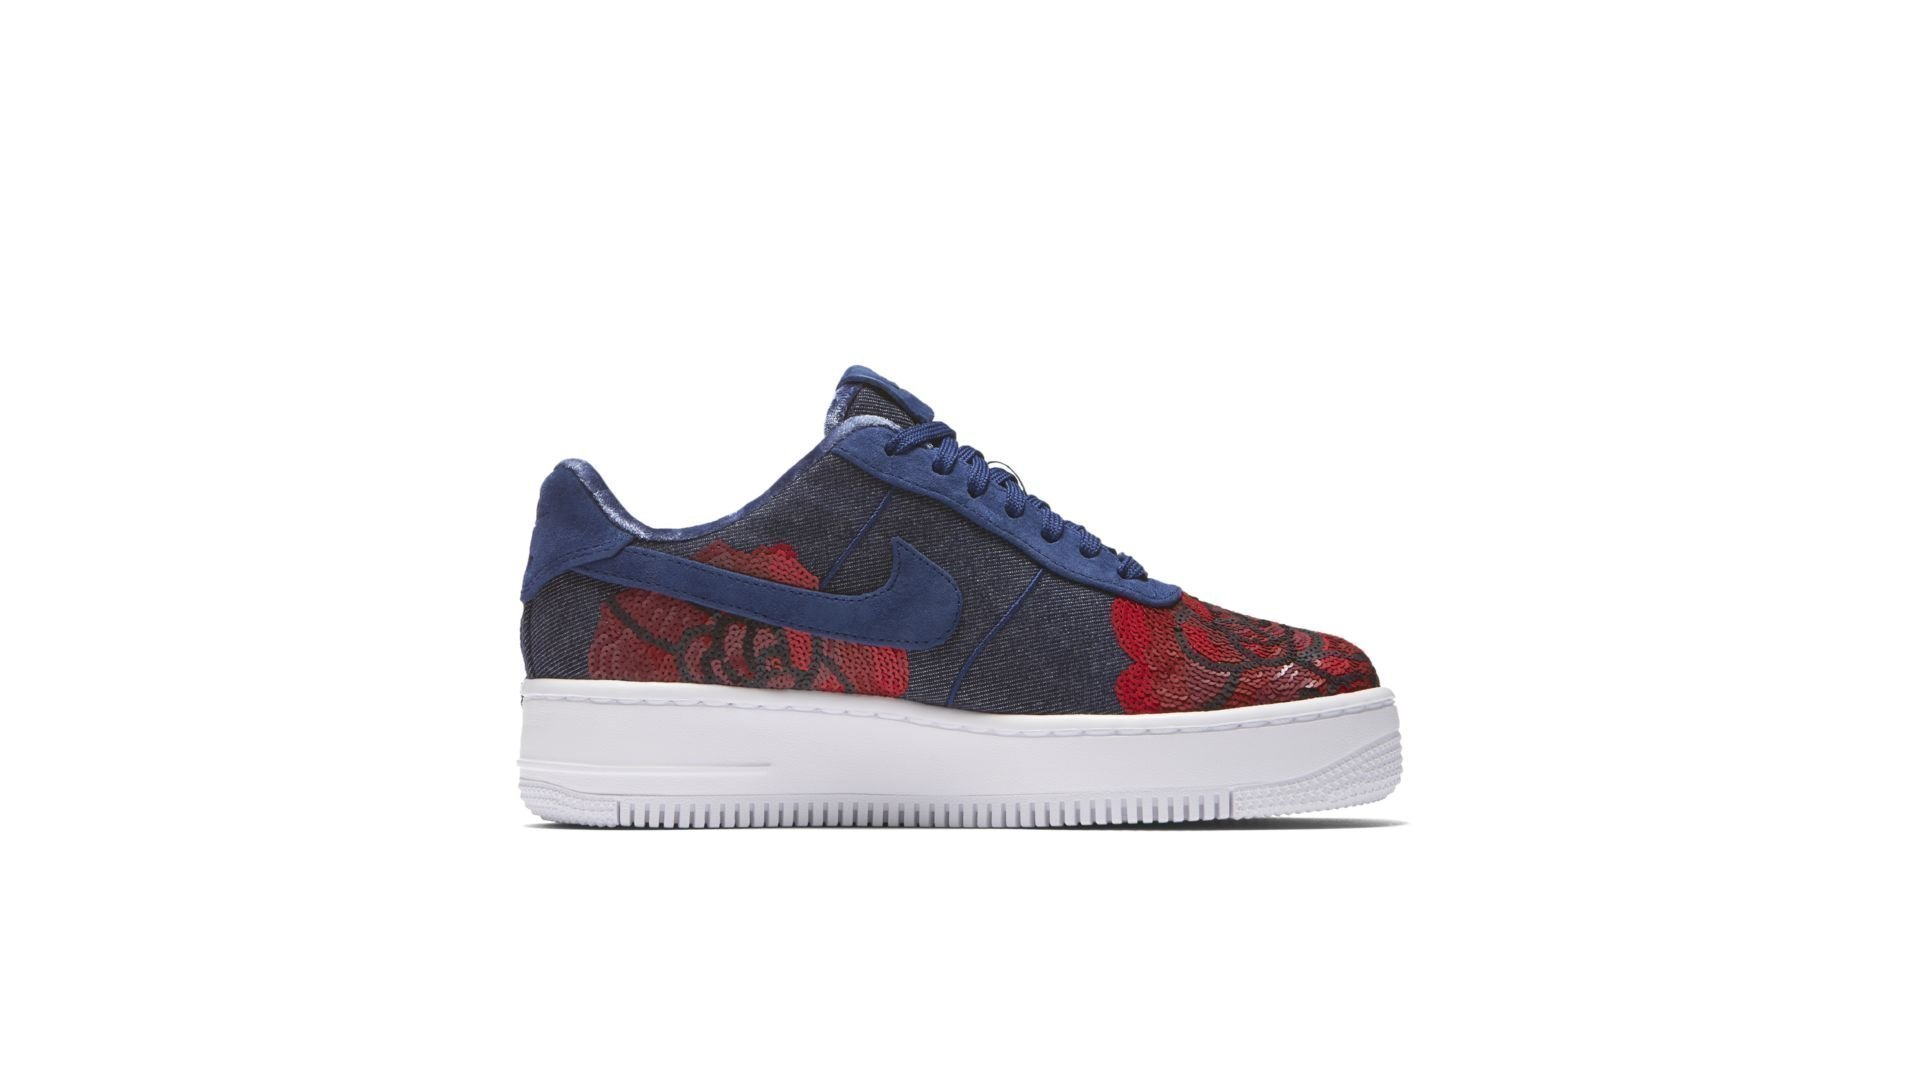 Nike Air Force 1 Upstep Low Denim Rose Blue (W) (898421-401)